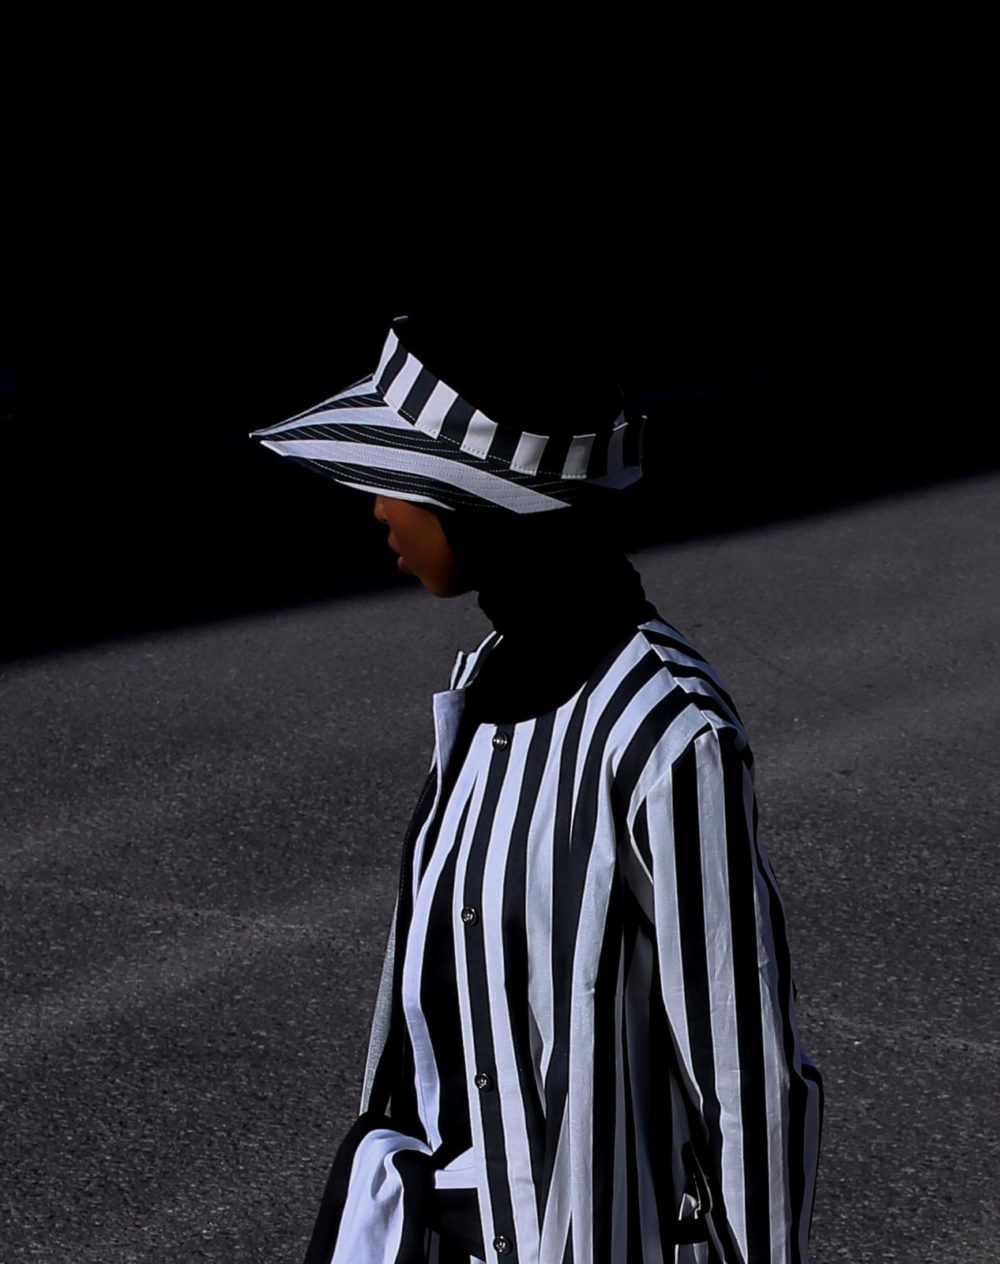 Vimma ANTON suncap Striped black-white Onesize - ANTON suncap, black-white, Onesize, Striped